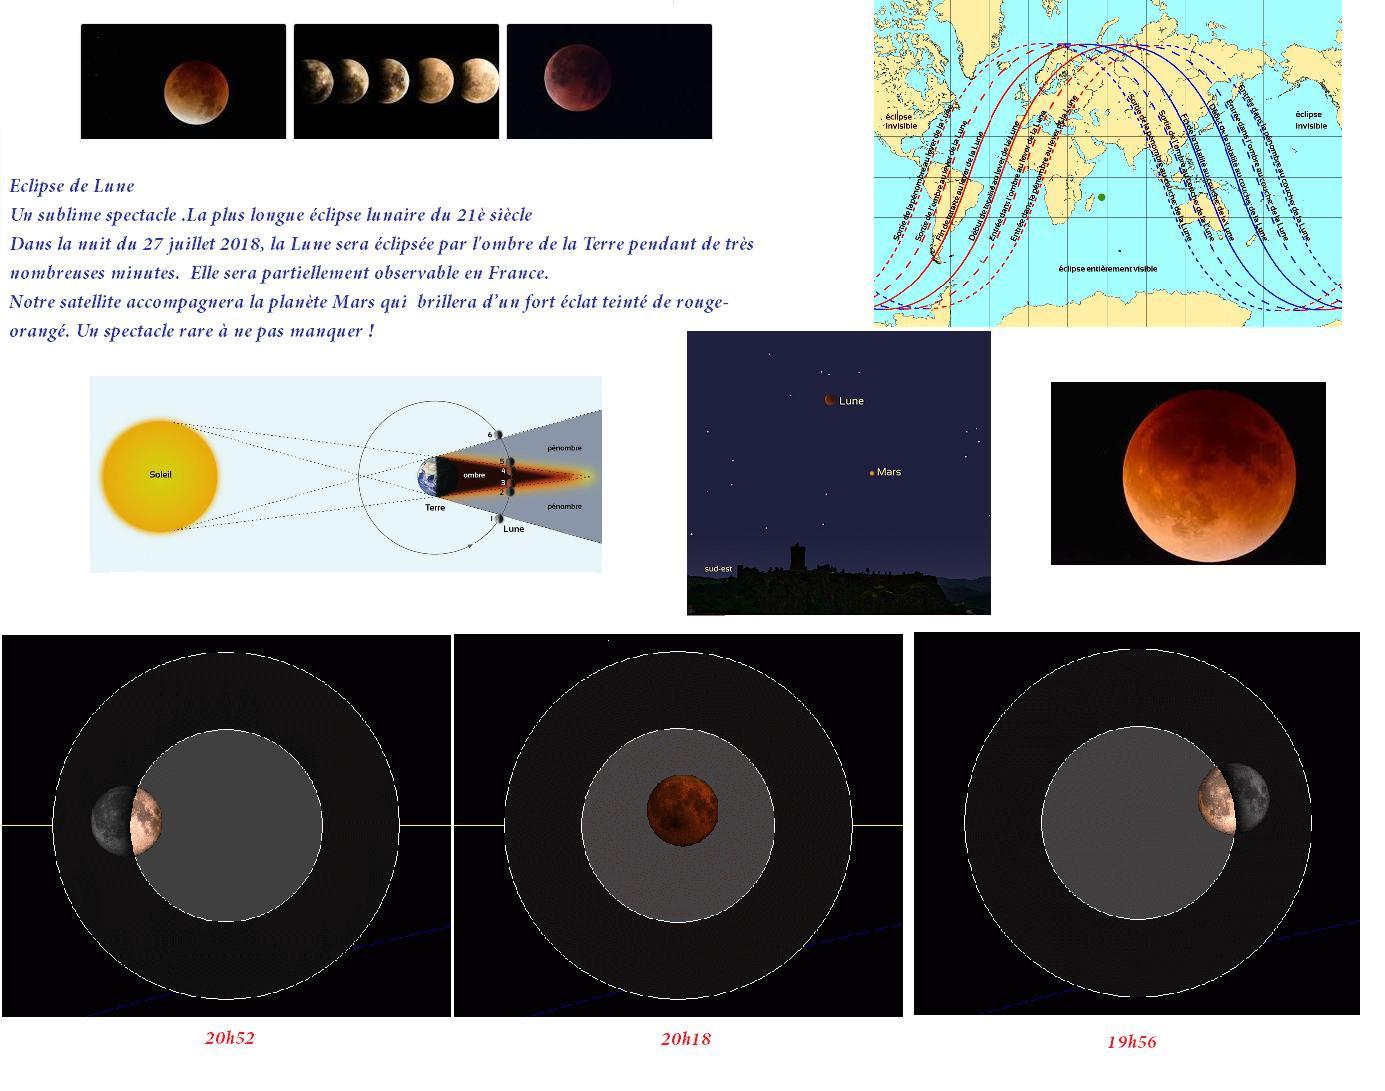 Eclipse lunaire 28 juillet 2018